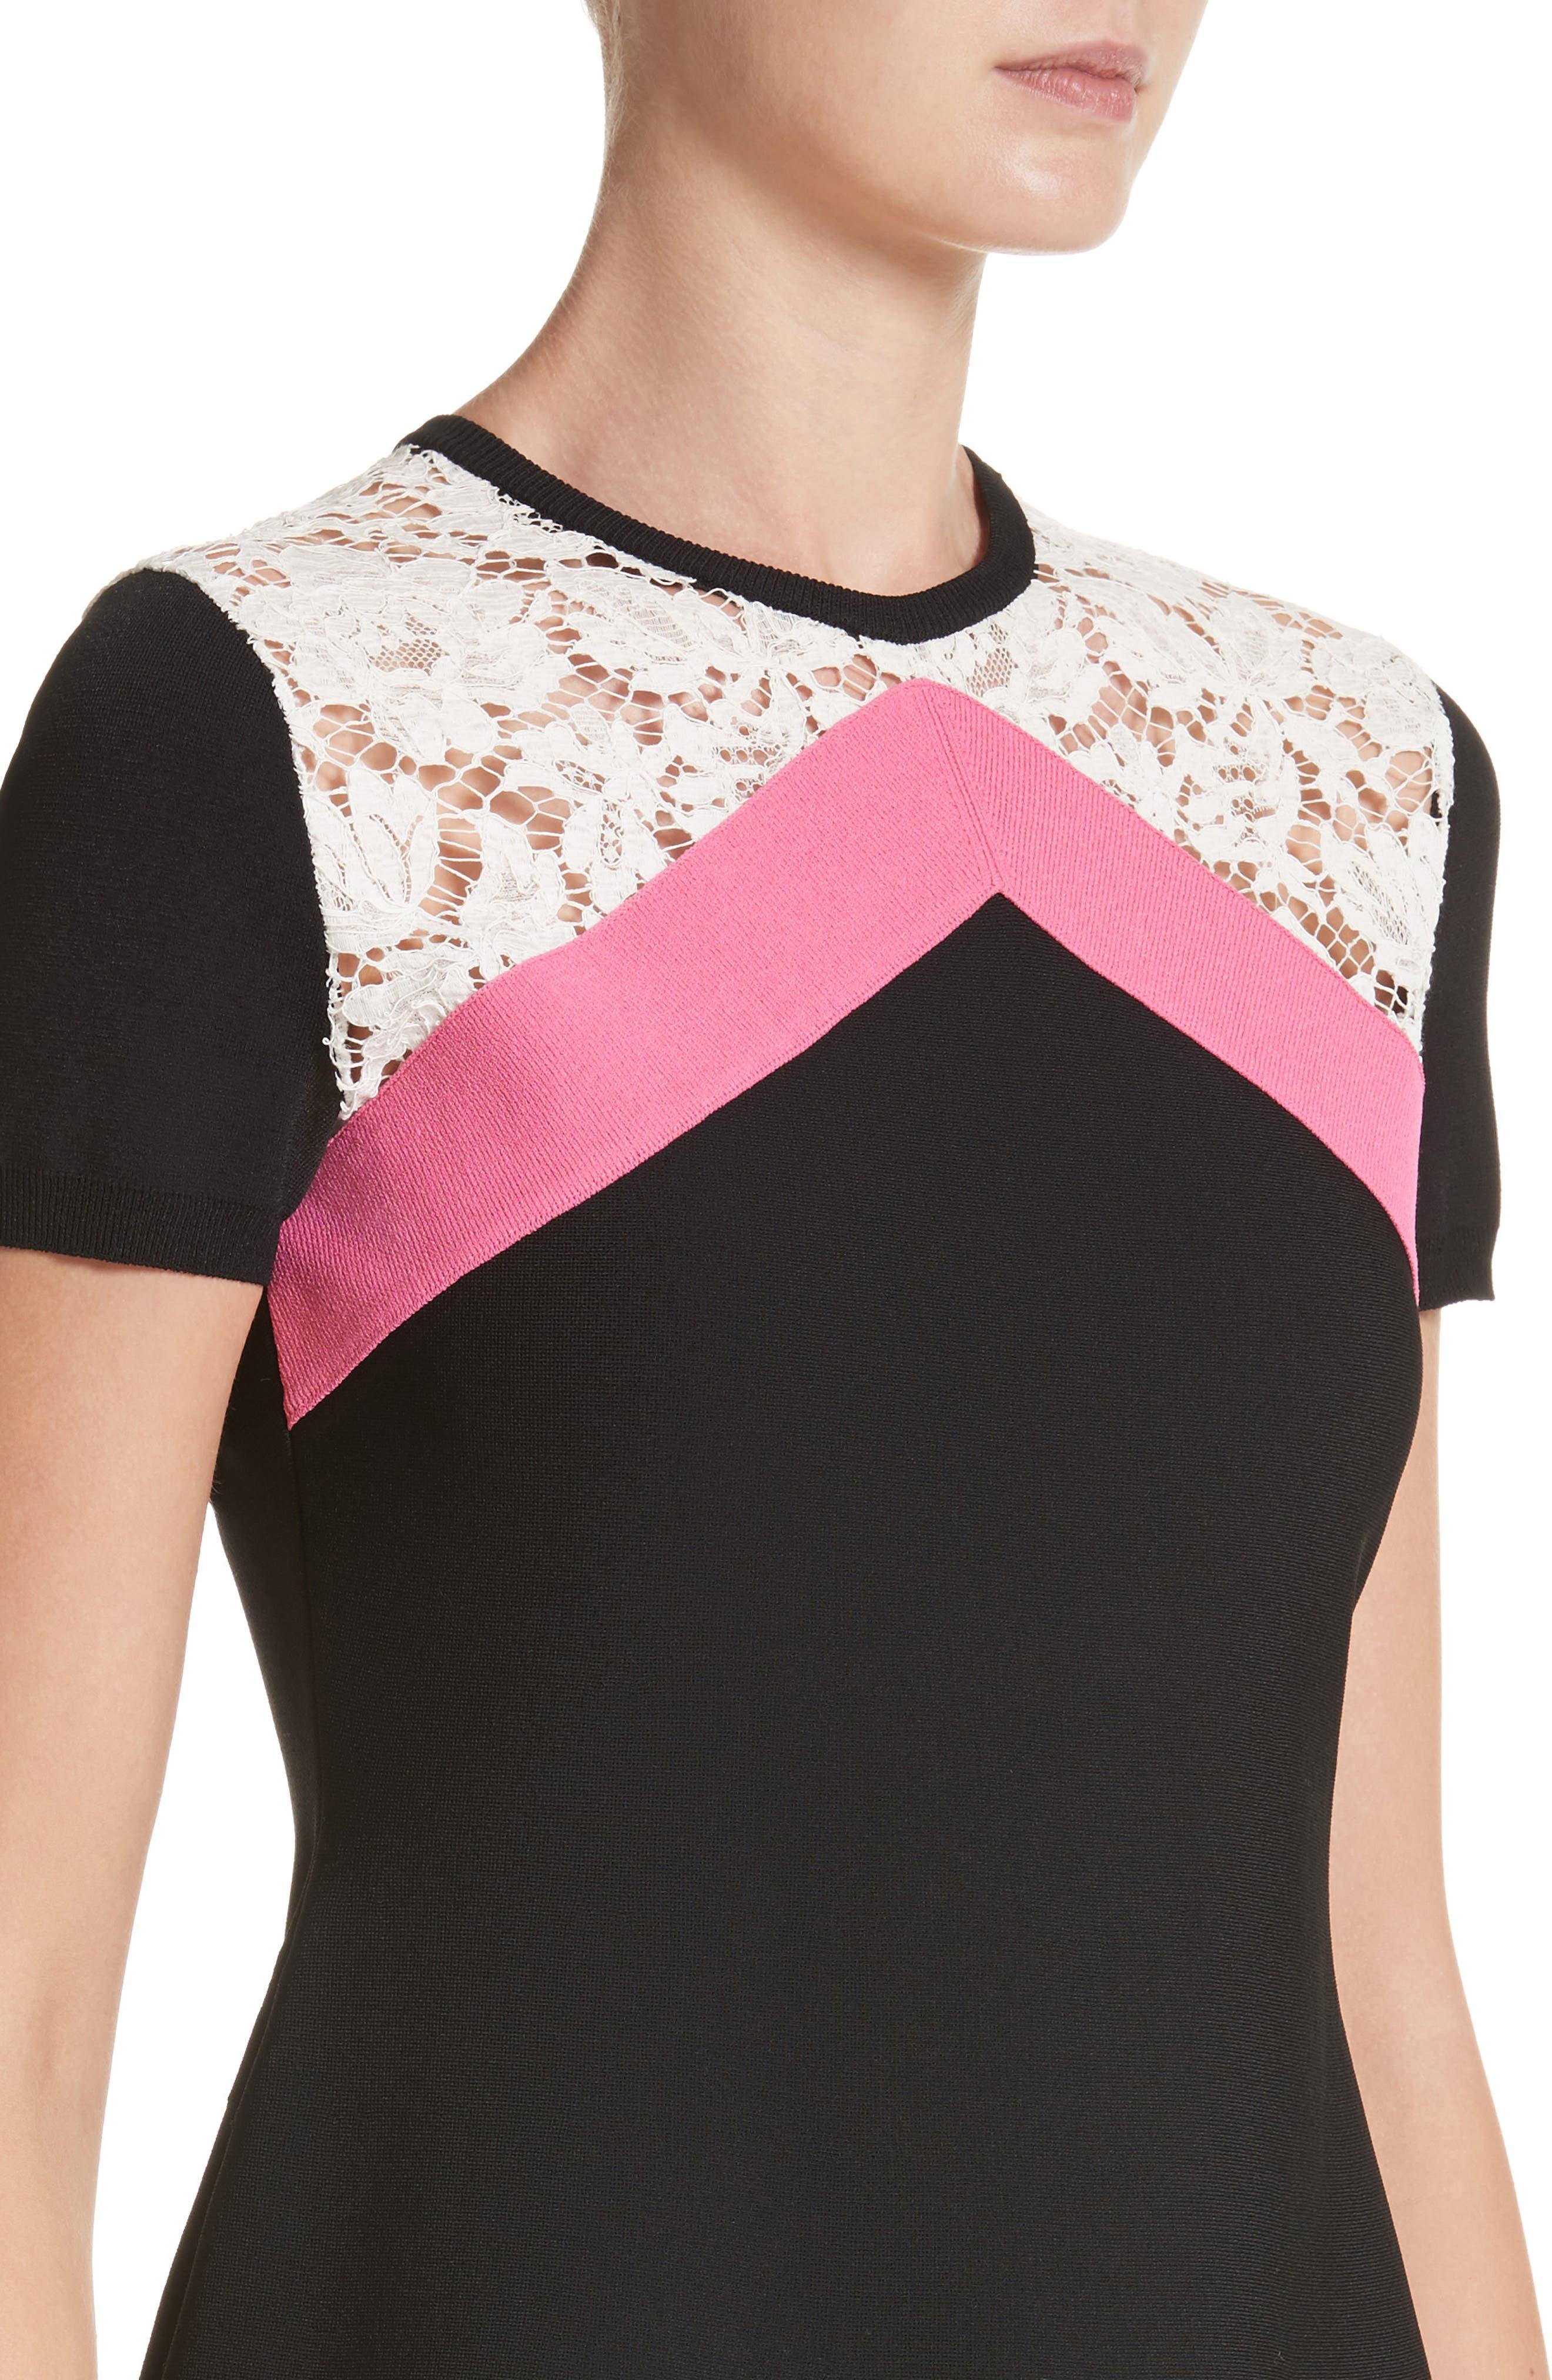 Chevron Lace Knit Dress,                             Alternate thumbnail 4, color,                             001